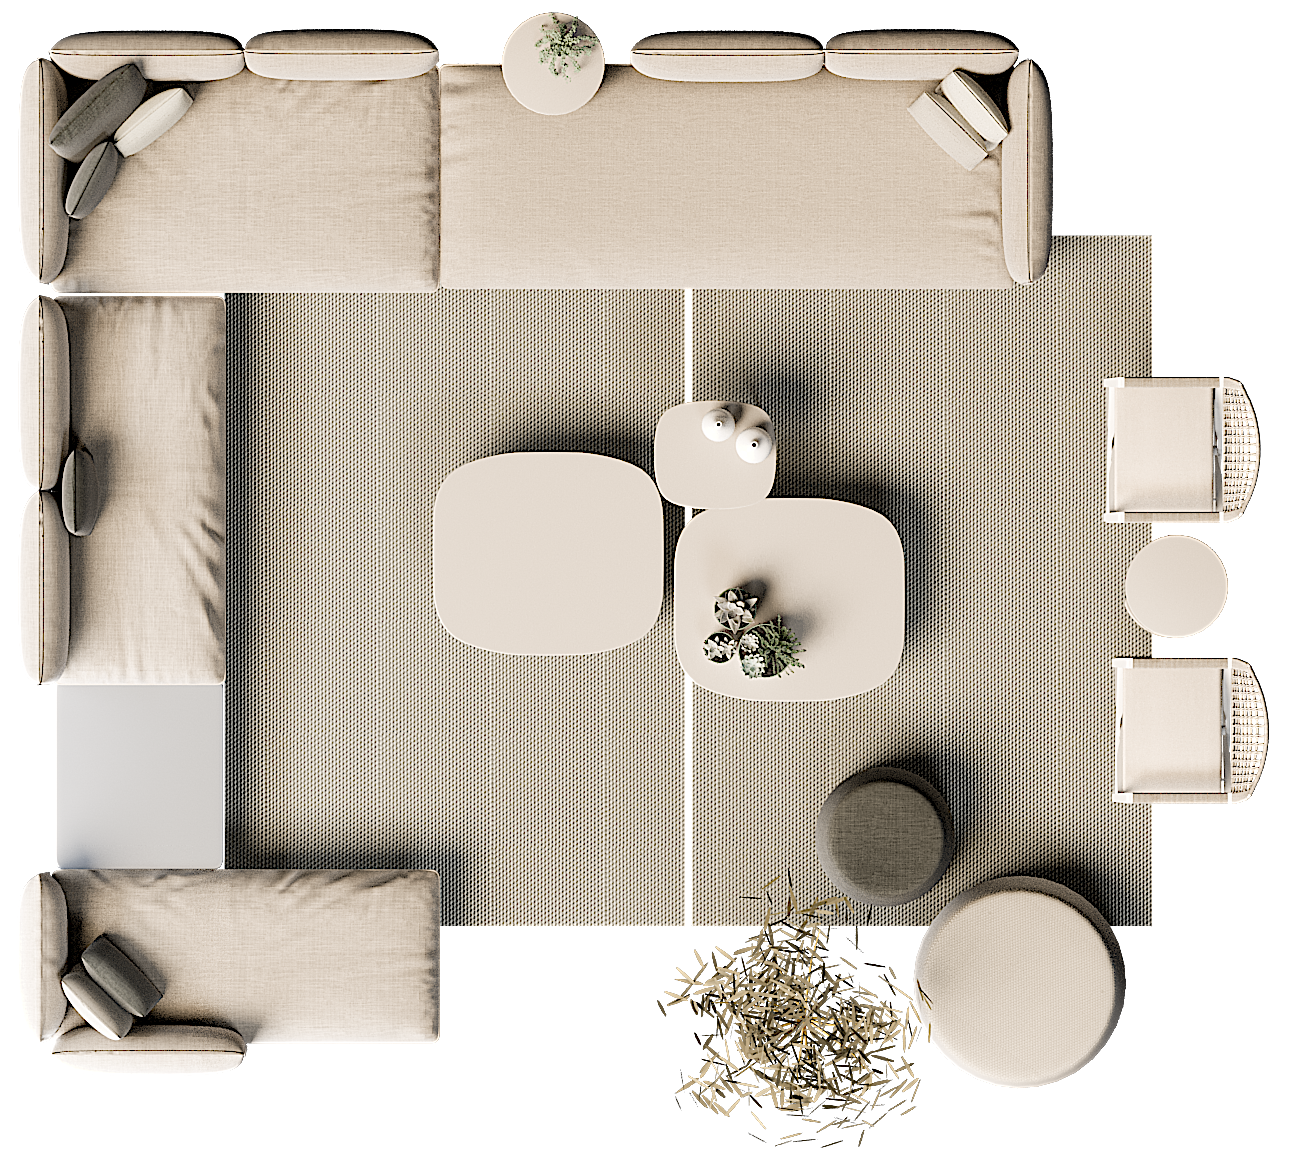 Senja Sofa Top Furniture Furniture Layout Luxury Living Room Design